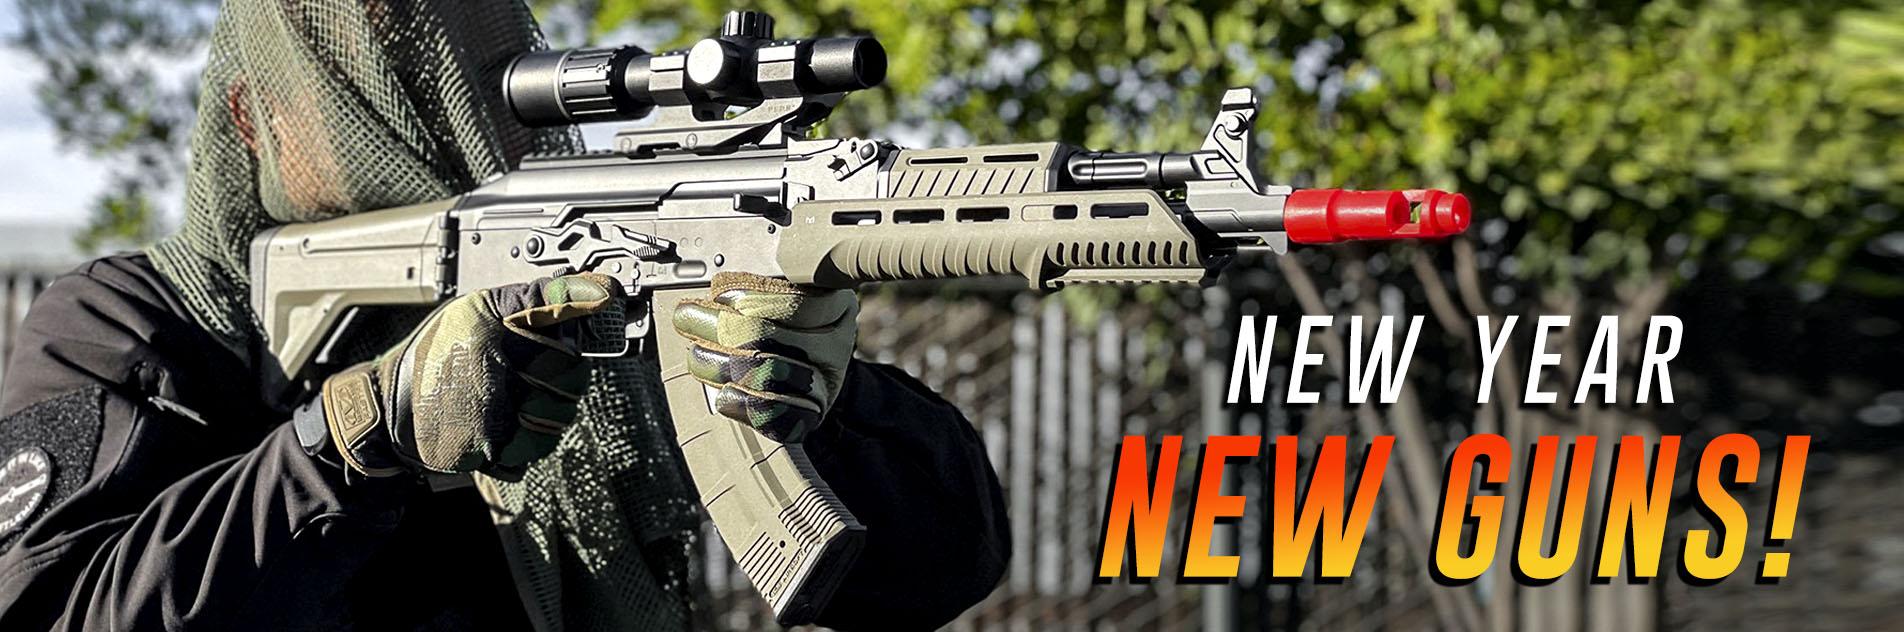 New Year New Guns